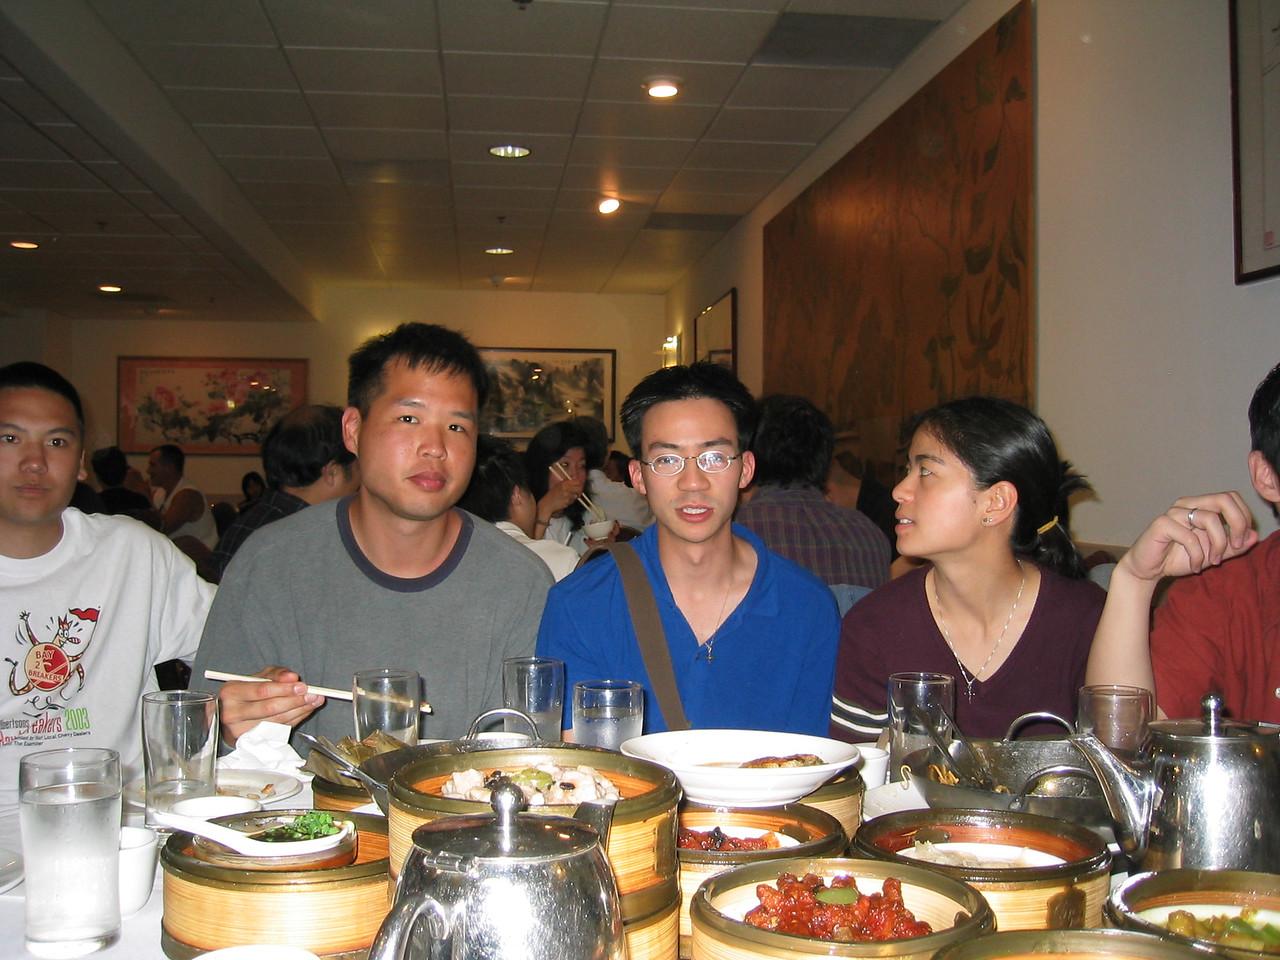 Alan, Jeff, Ben, Audrey, & Andy with flash